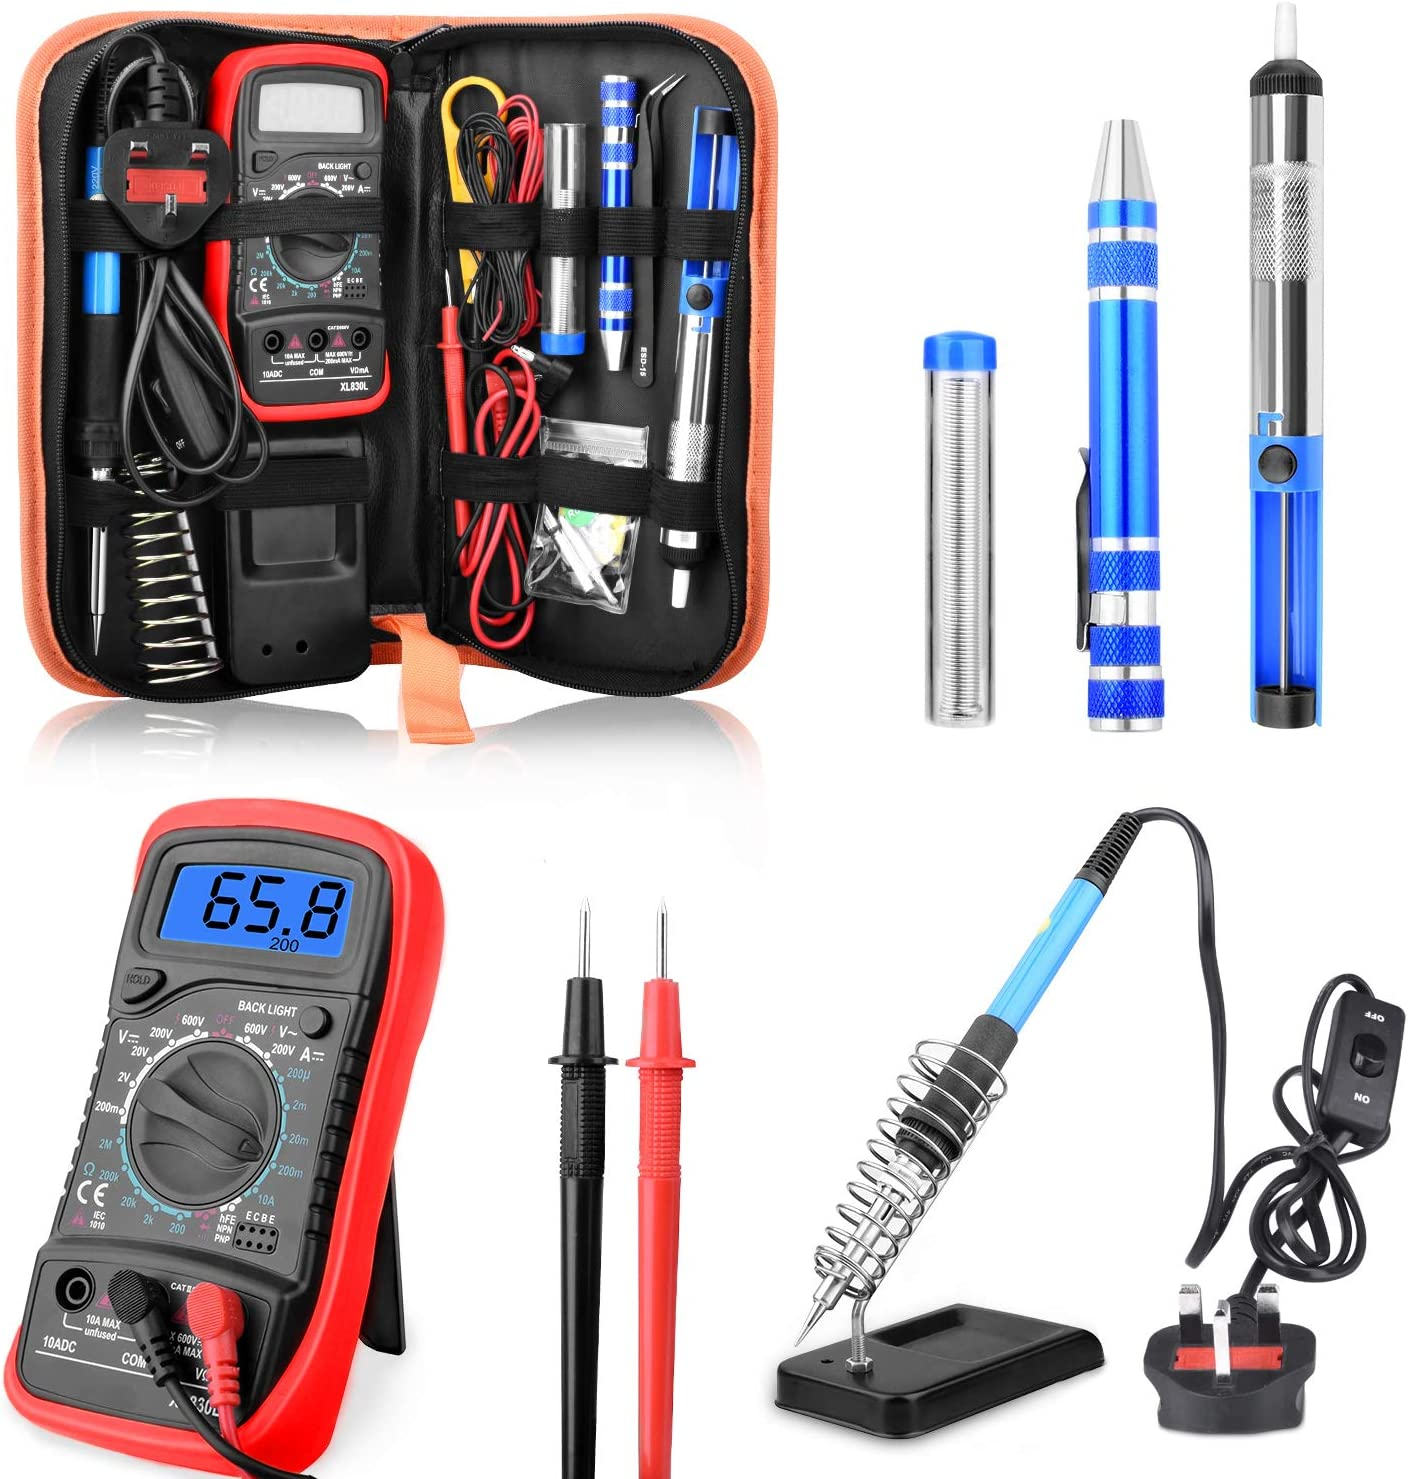 60W Soldering Iron Kit Electronics Welding Tool Adjustable Temperature UK